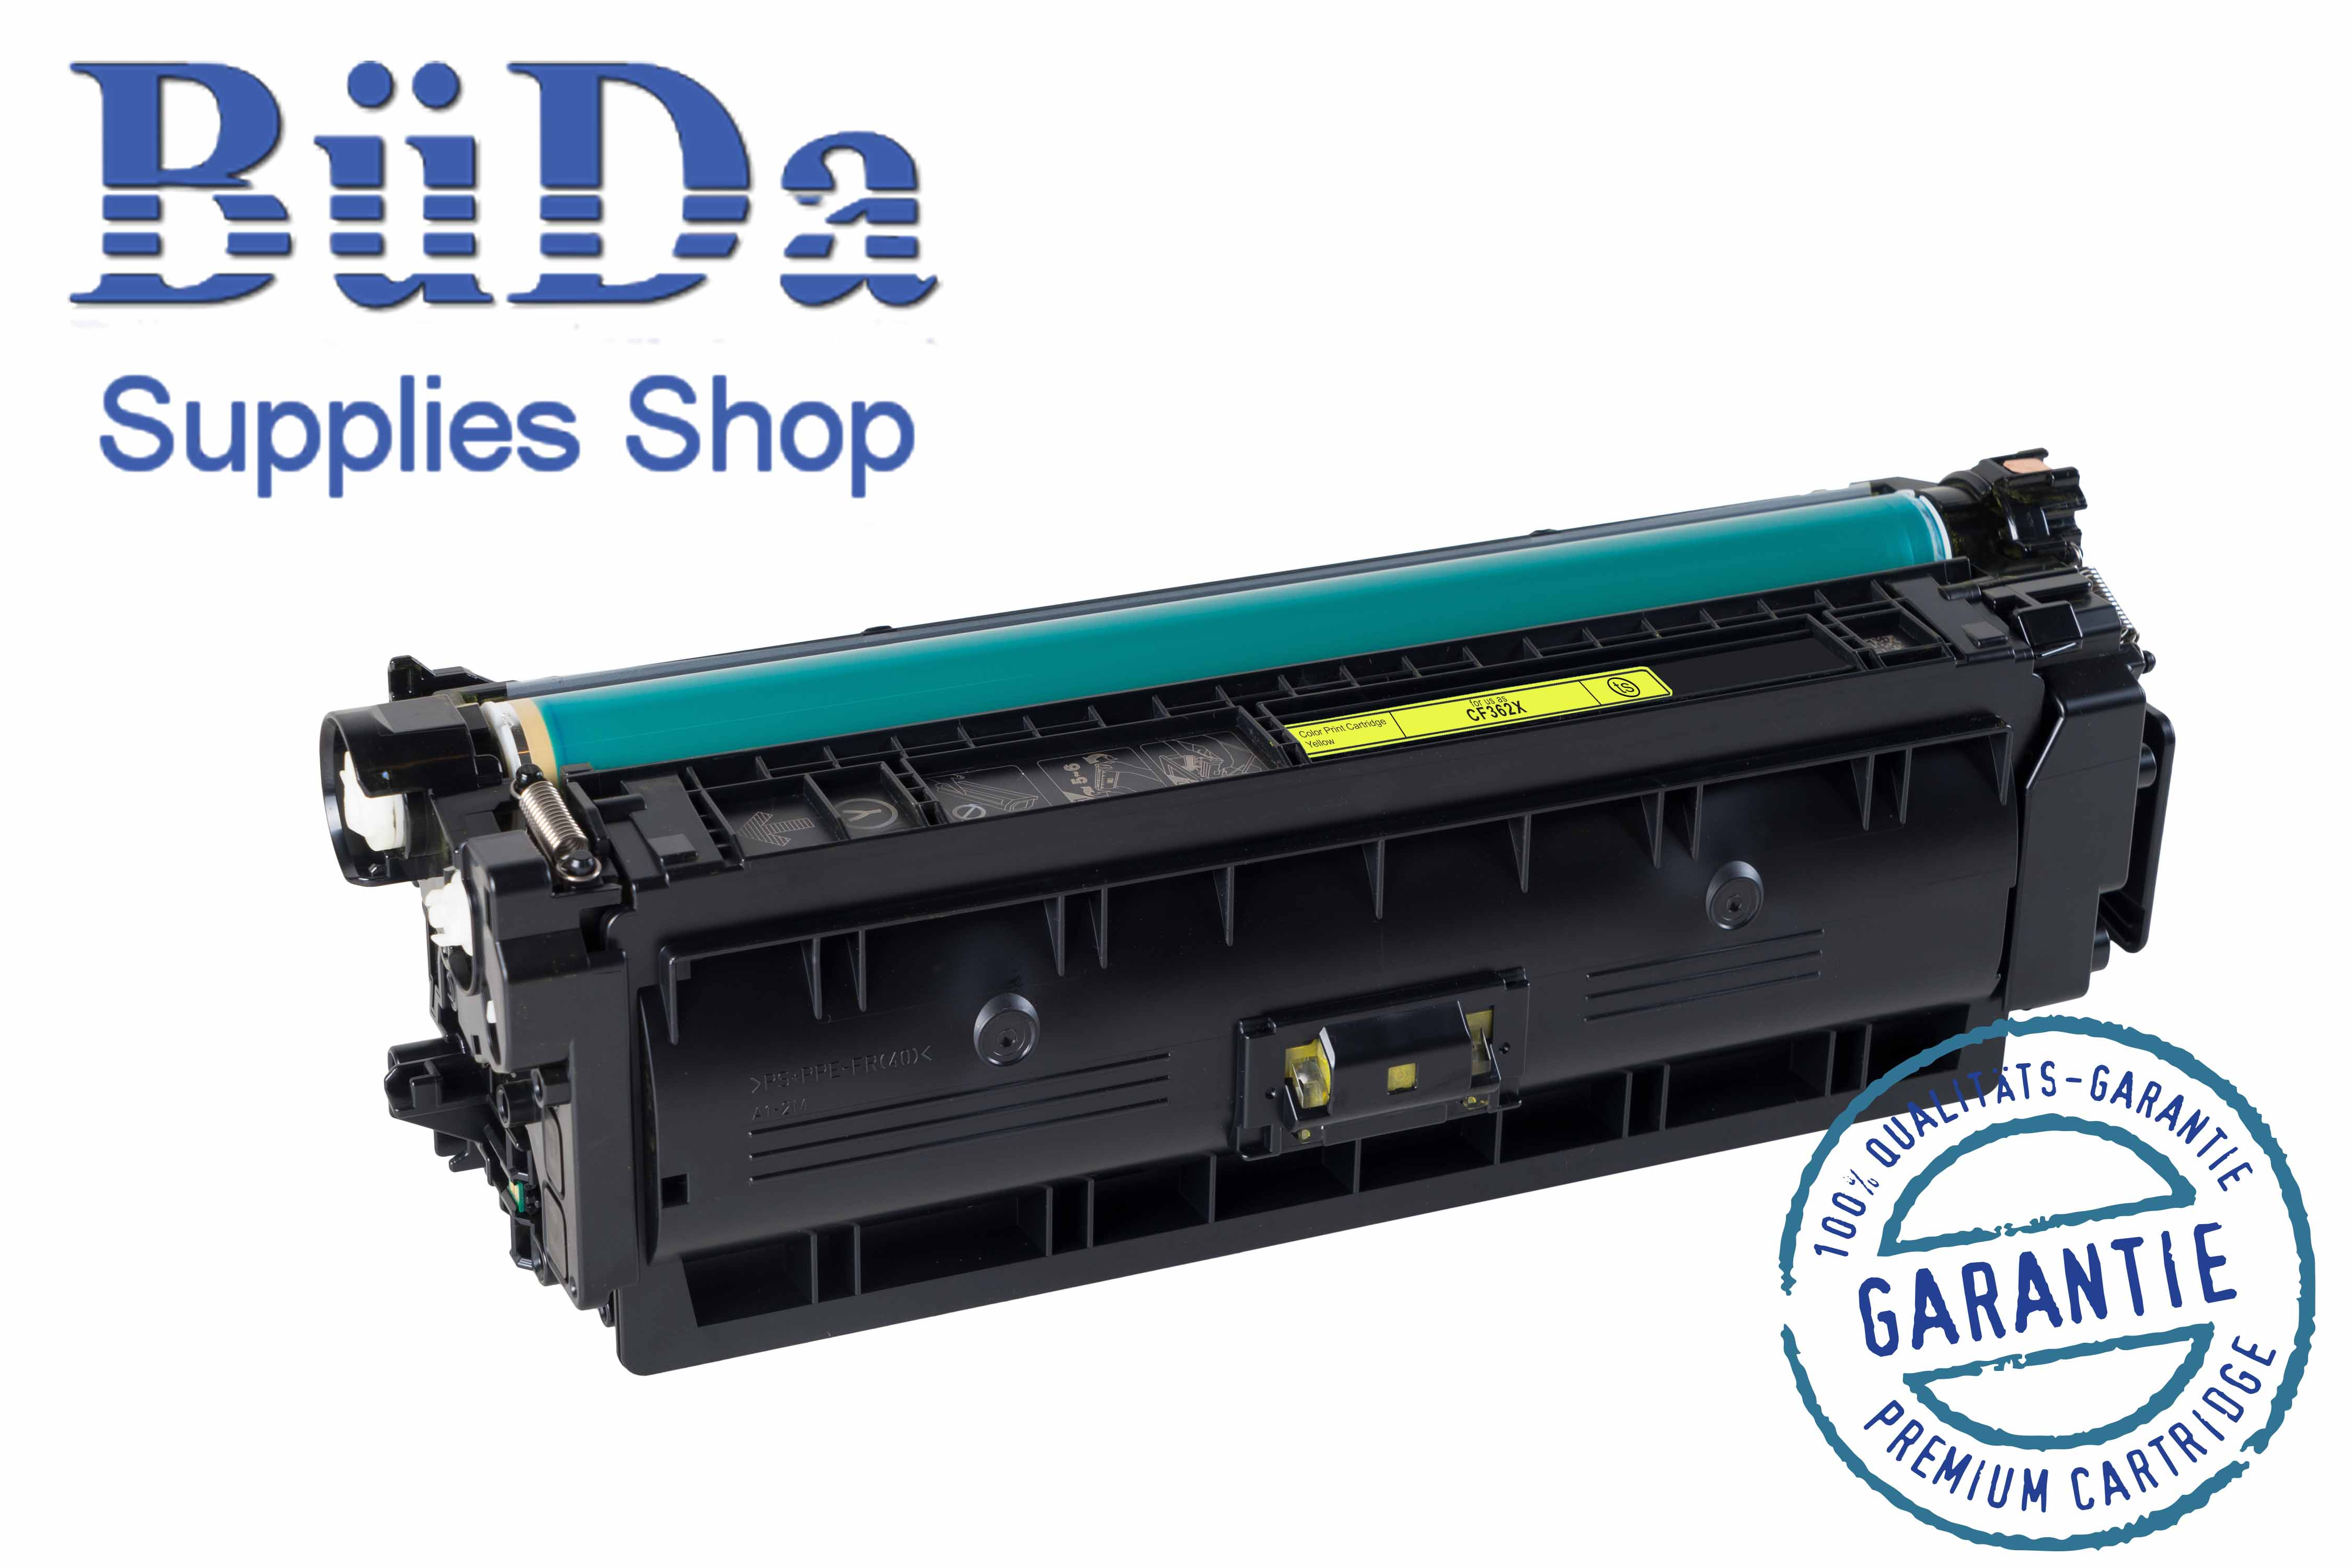 Toner-Modul komp. zu CF362X / CRG 040HY yellow 9500 Seiten